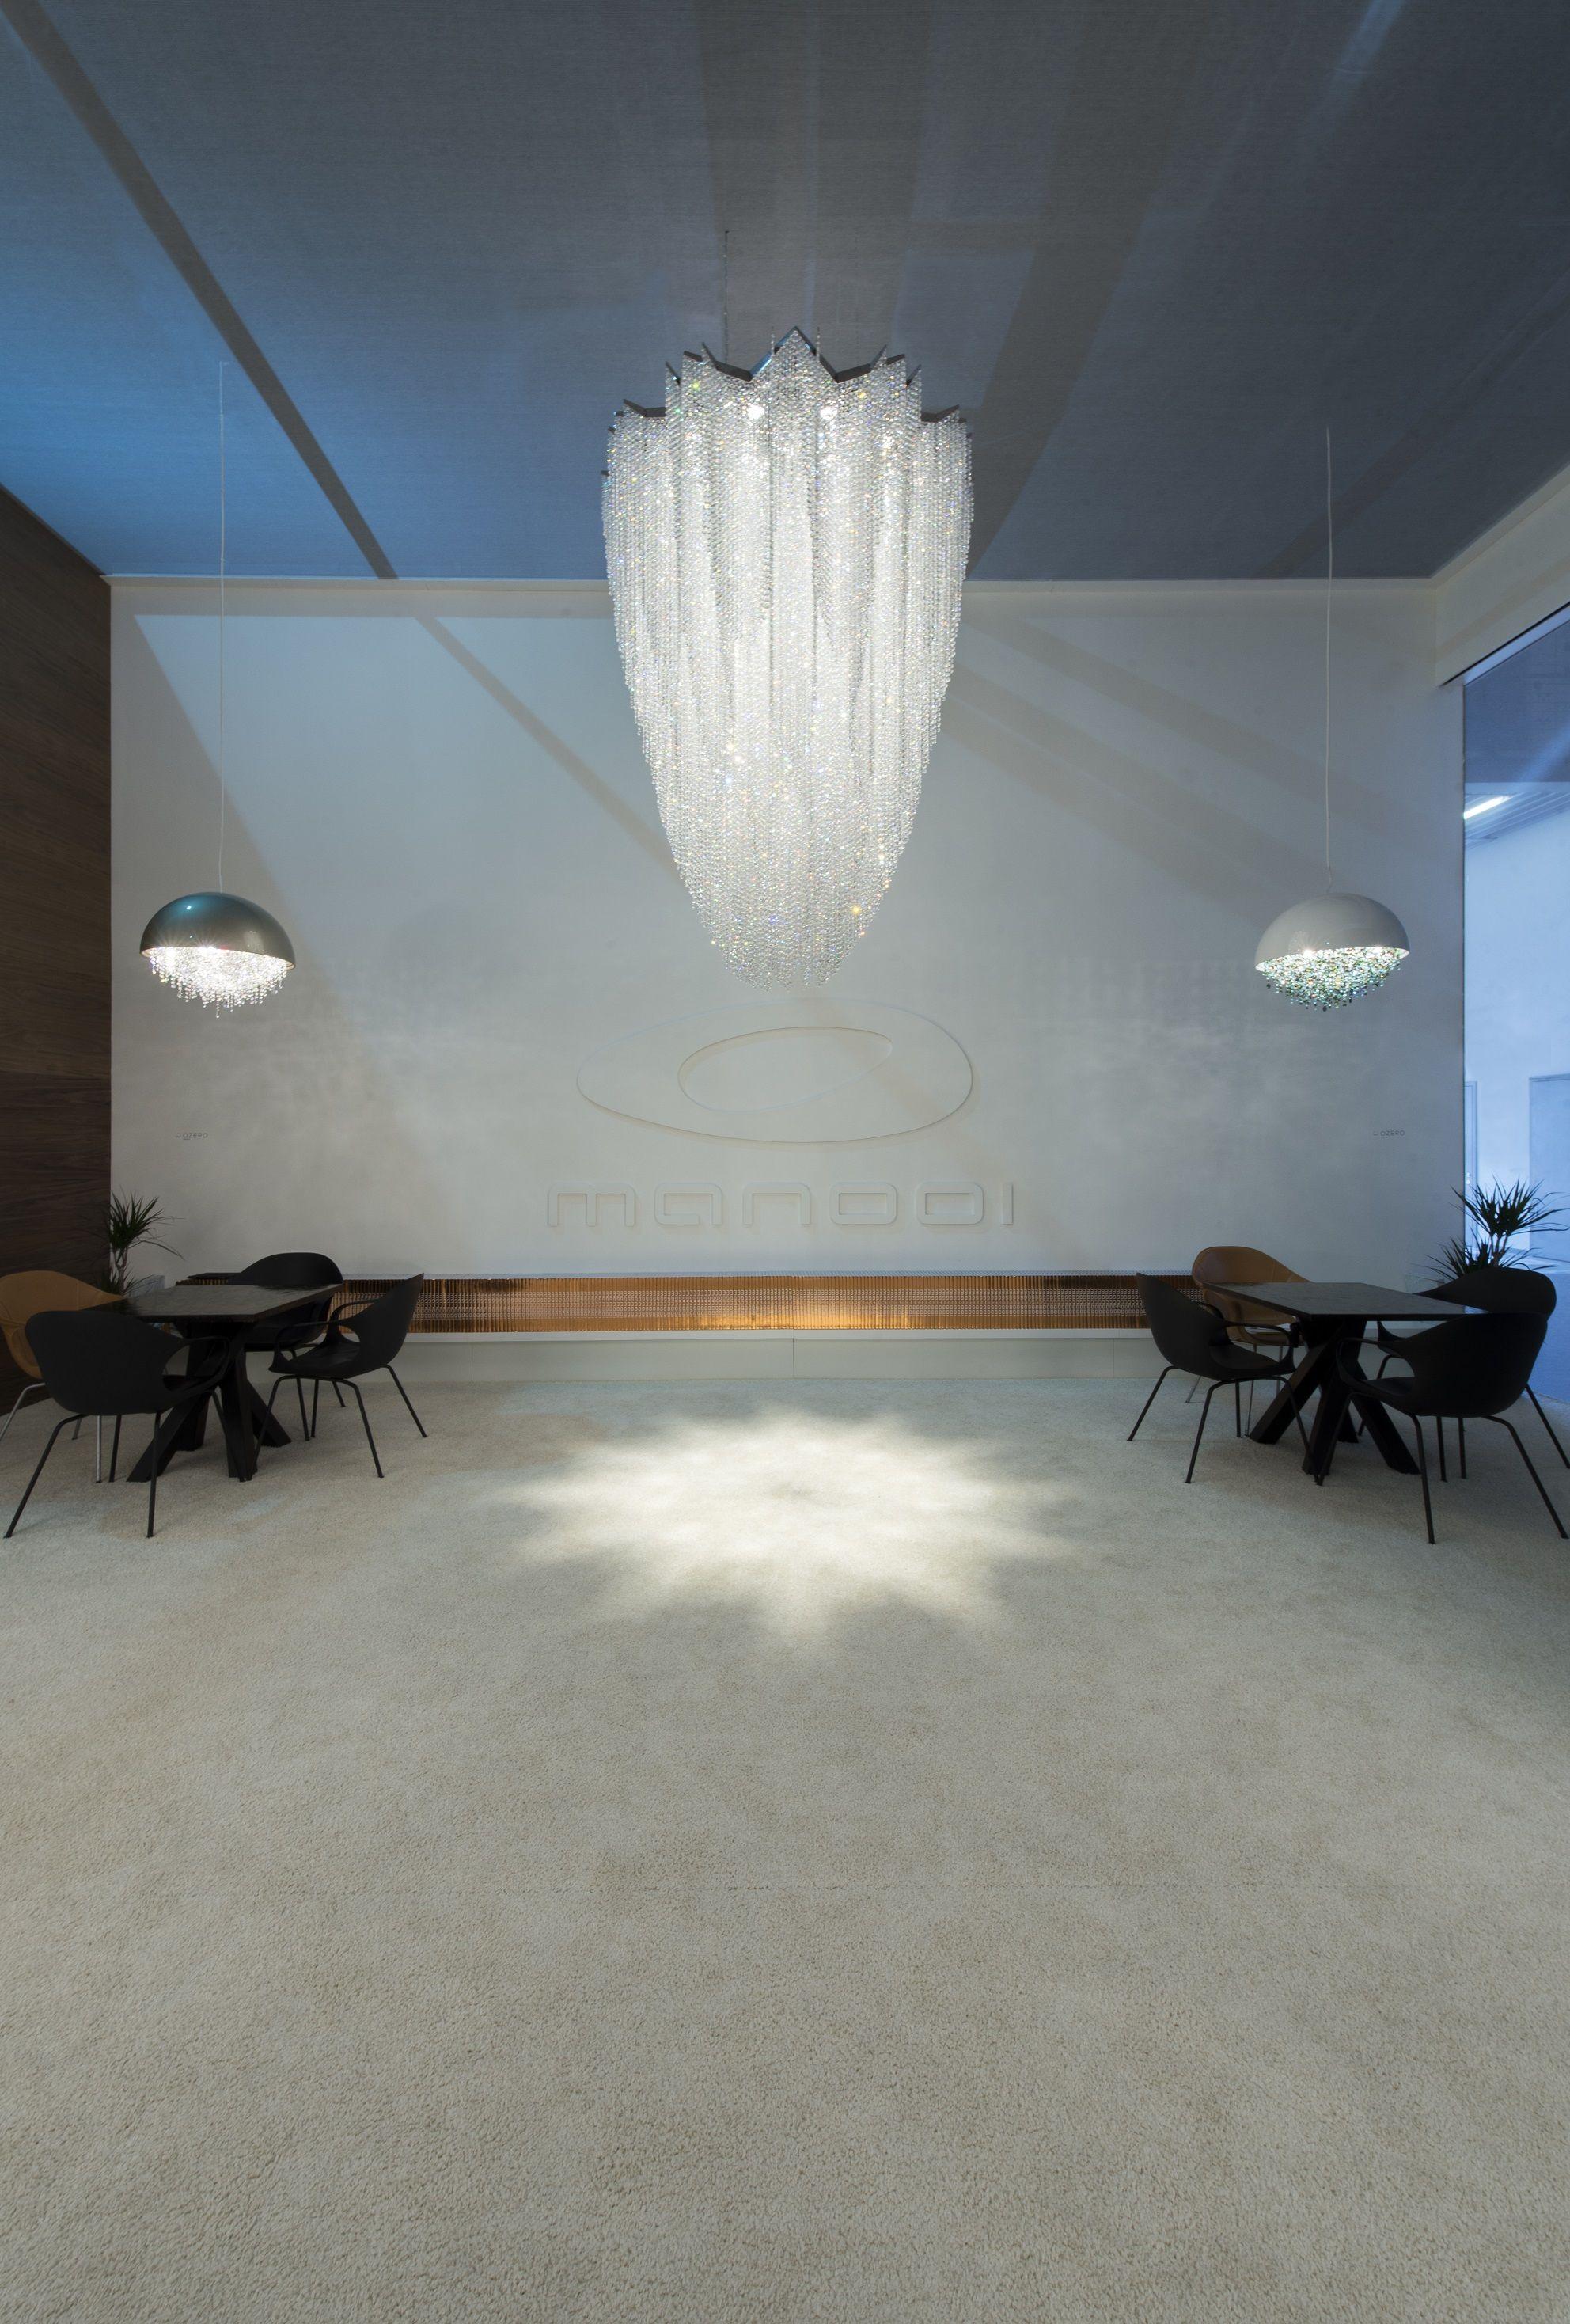 Burj crystal chandelier #crystalchandelier #crystal #luxury #lighting #design #interior #inspiration #Manooi